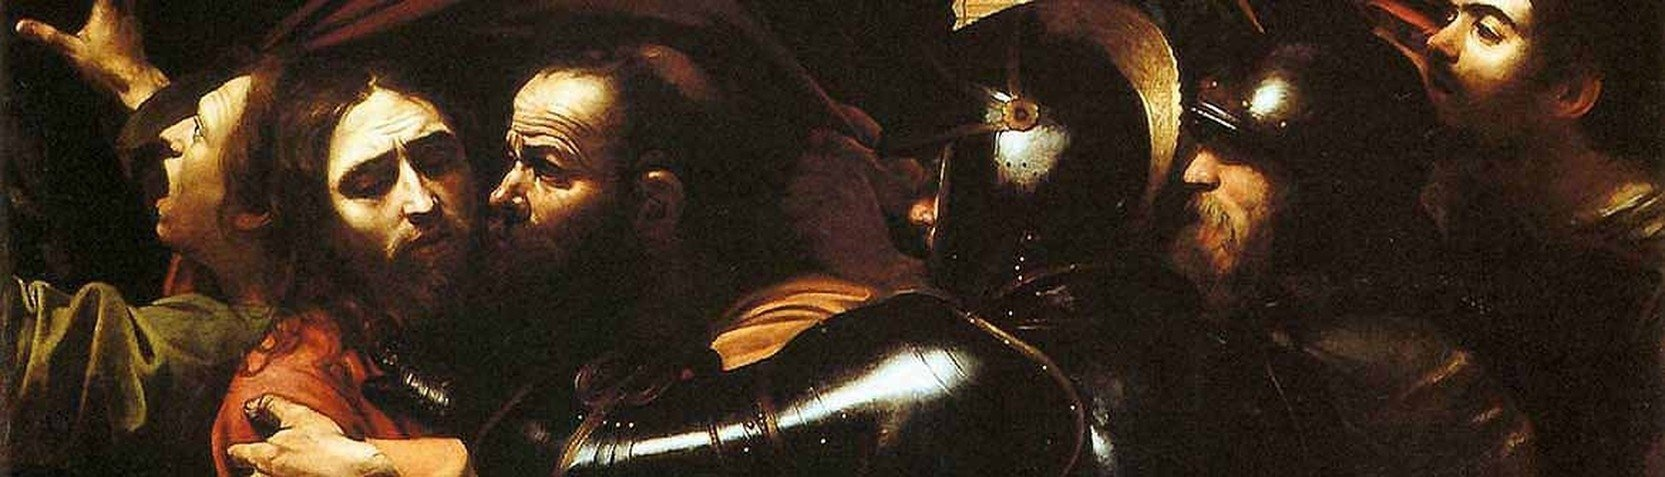 Artistes - Michelangelo Caravaggio